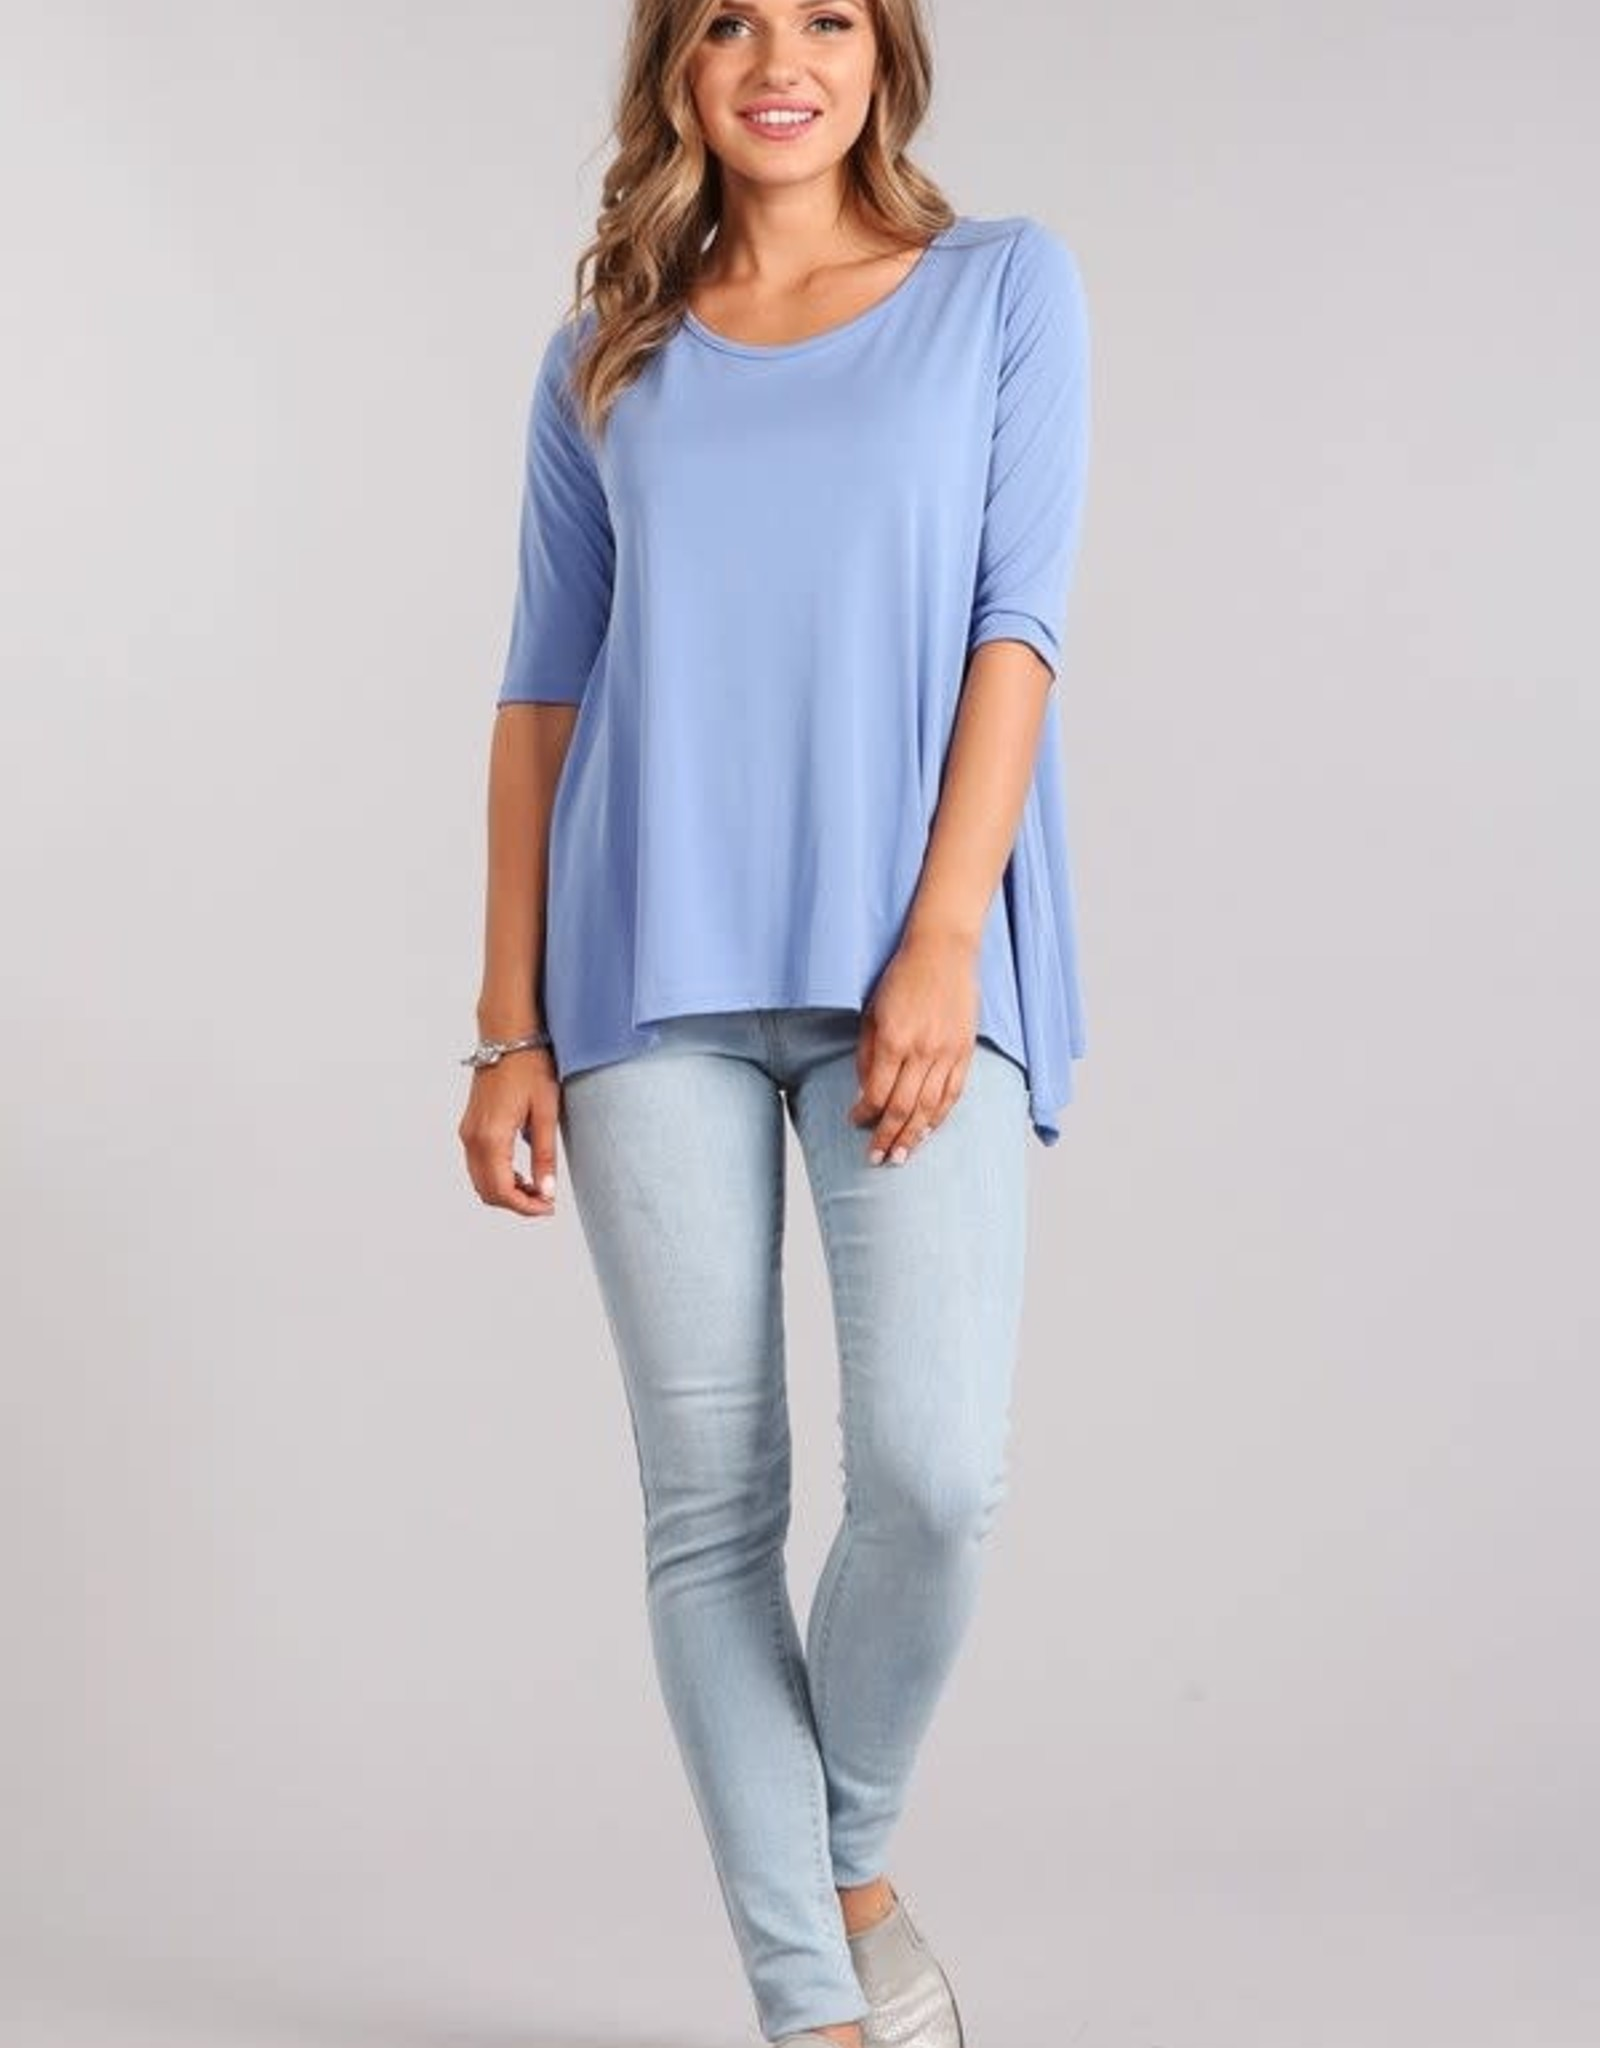 Miss Bliss Knit Basic Top- Indigo Blue